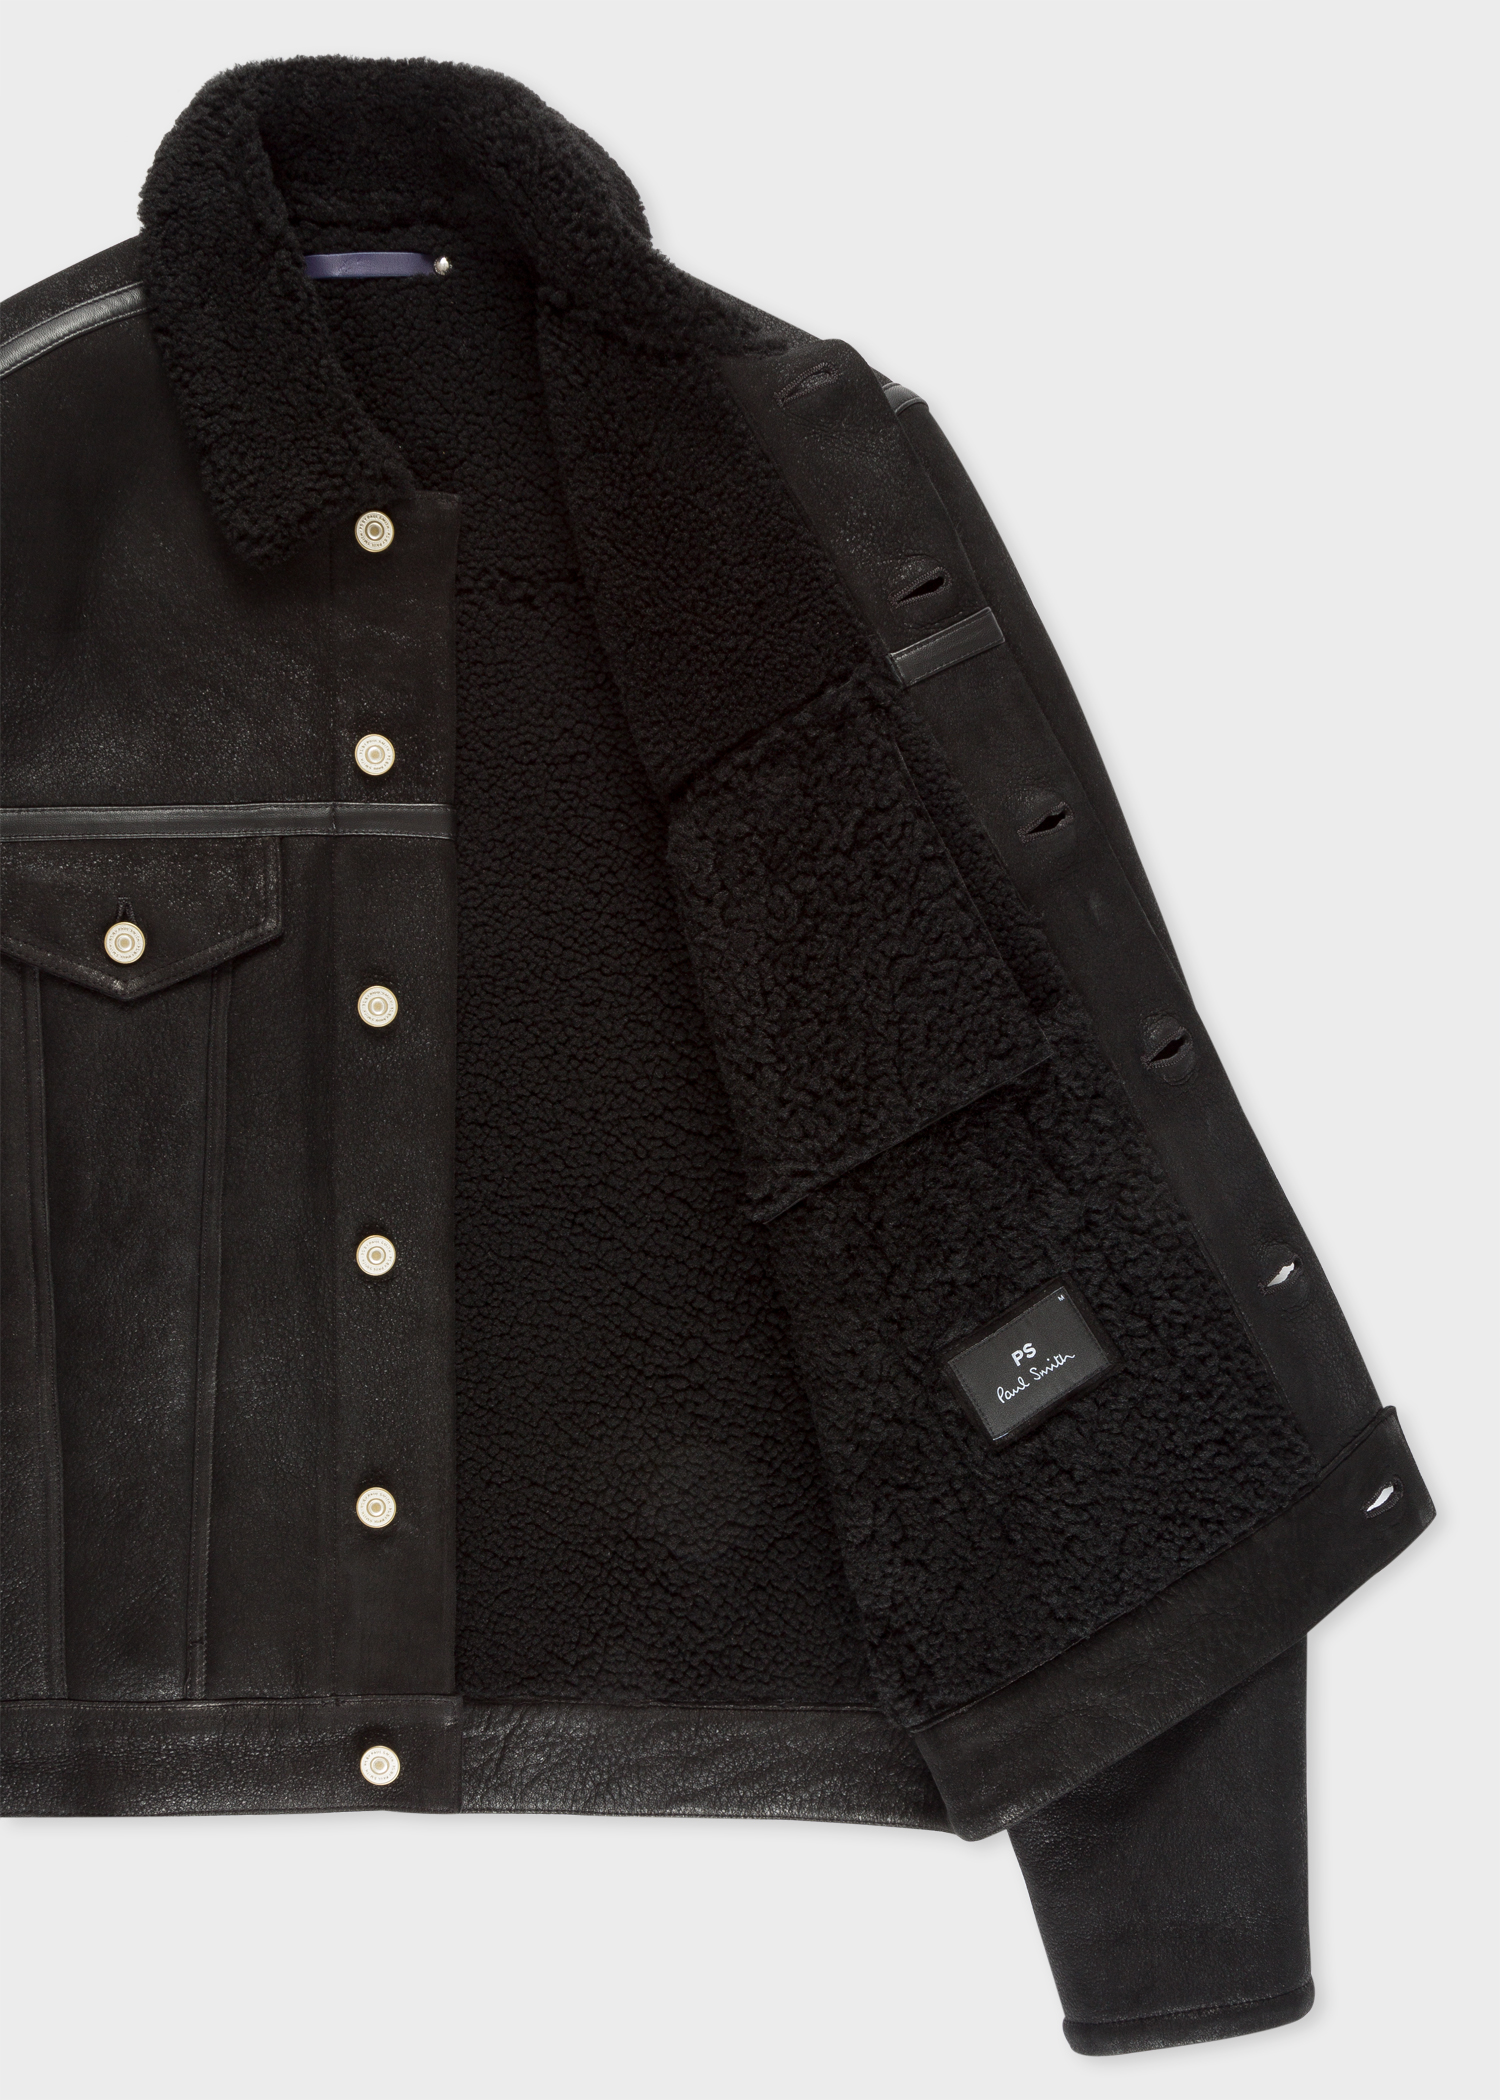 Men S Black Shearling Jacket Paul Smith Us